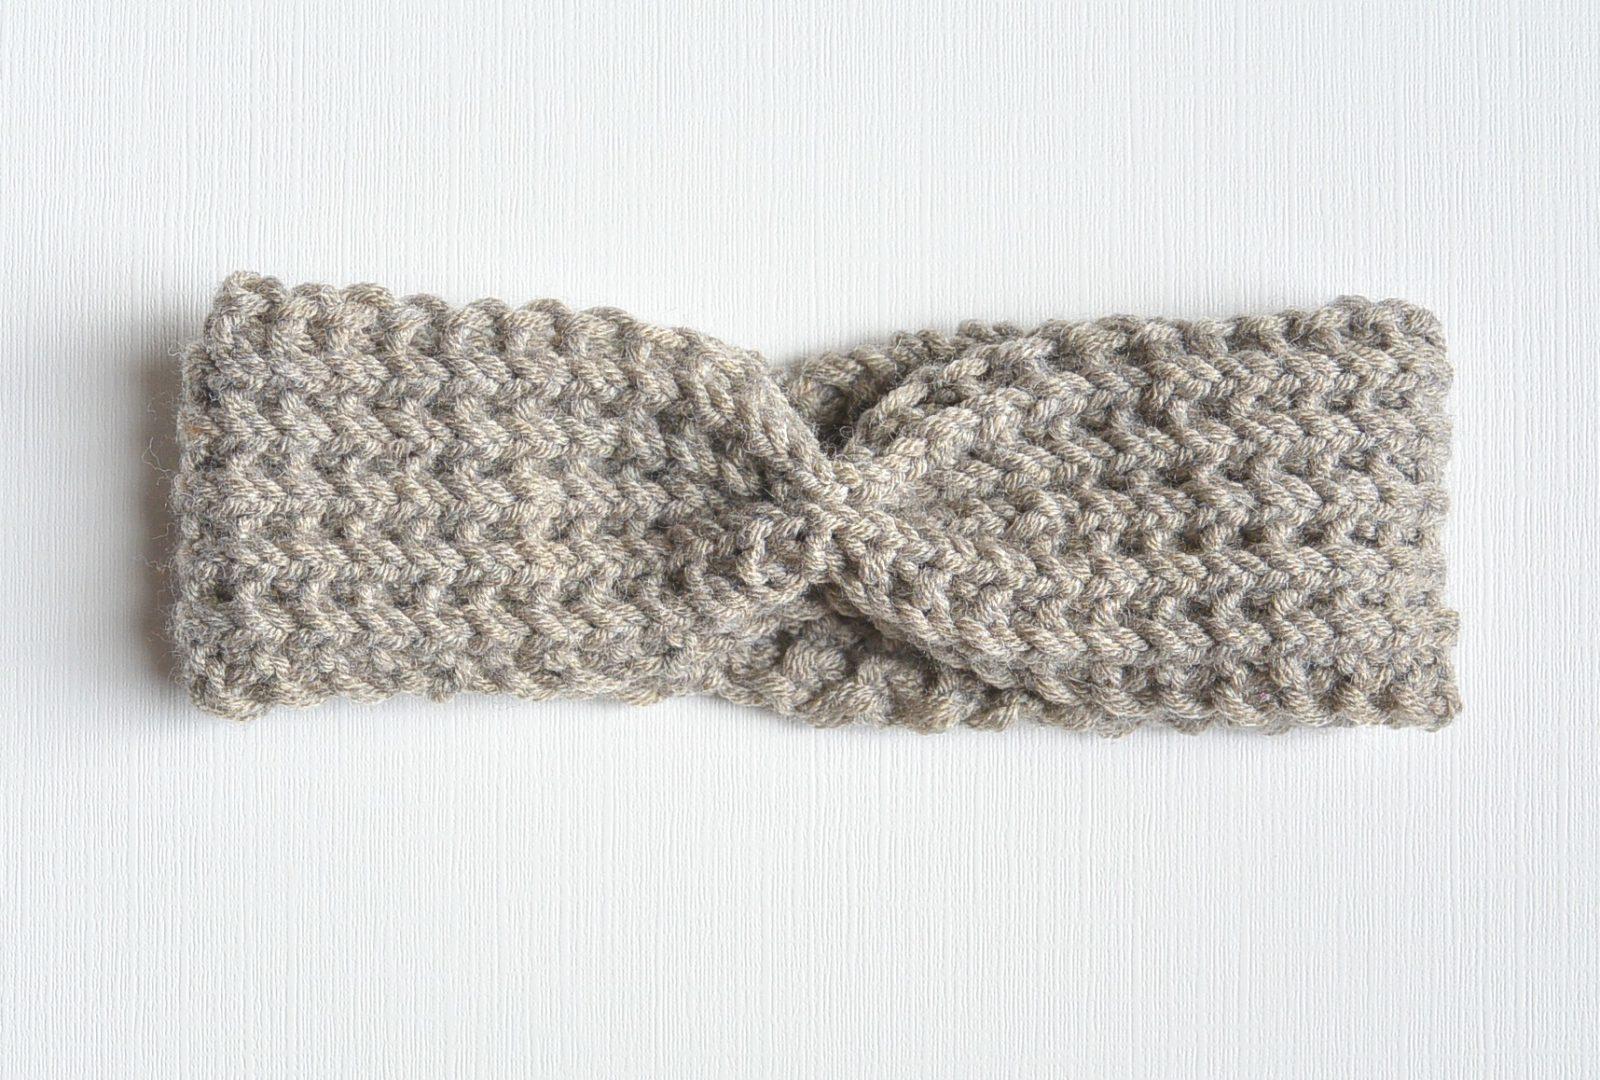 Half Fisherman Knit Headband & Downton Abbey Yarn